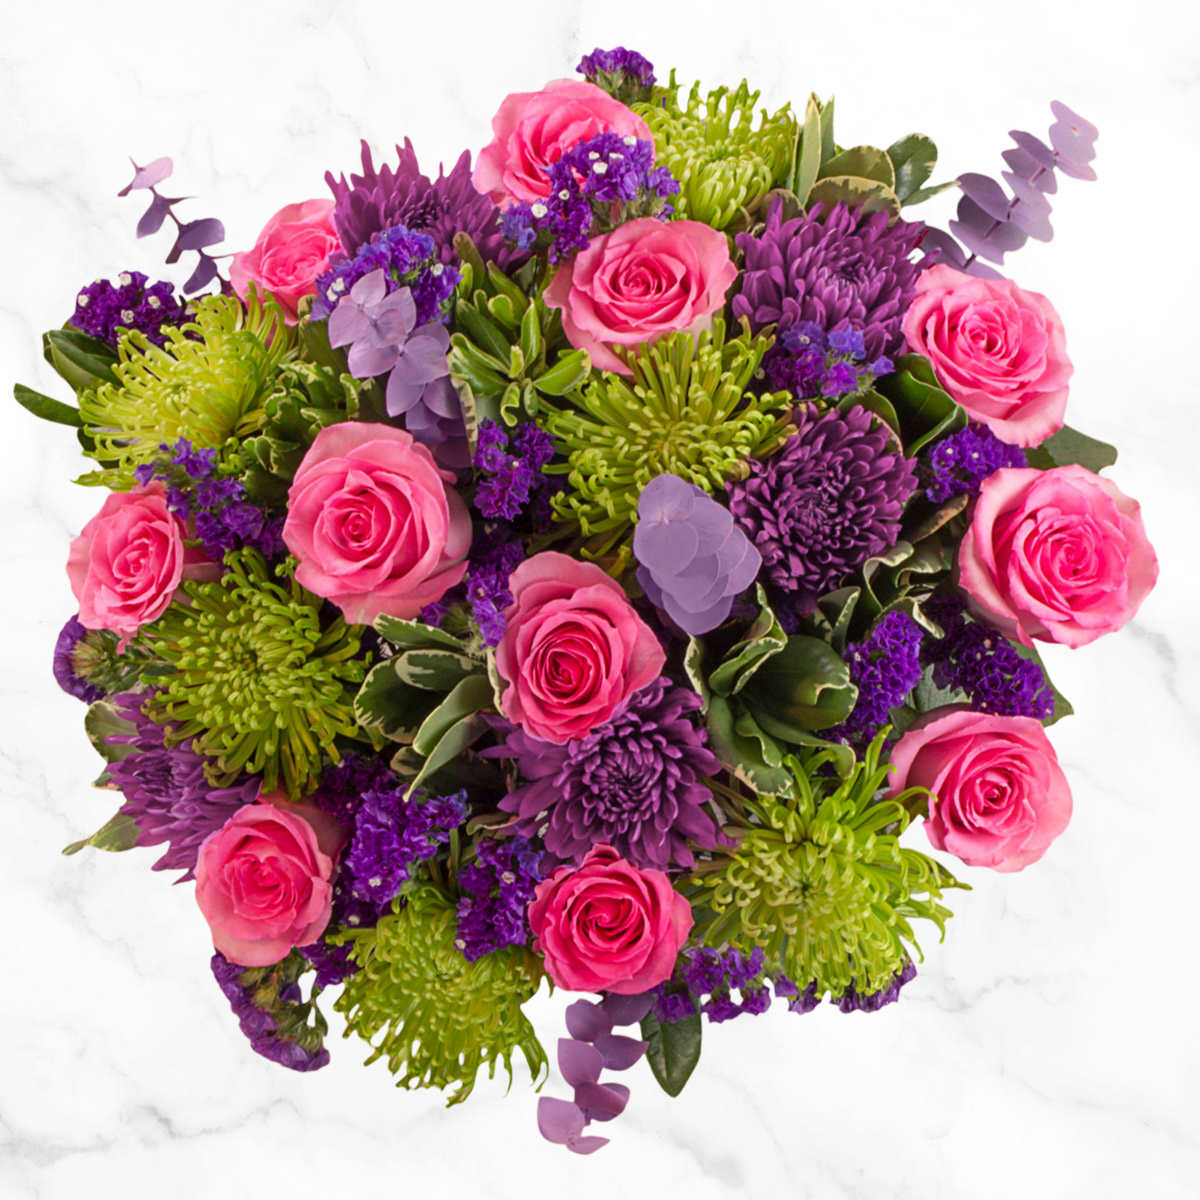 Pleasing 20 floral arrangement pictures design decoration of 40 floral arrangement pictures vase arrangements costco izmirmasajfo Images